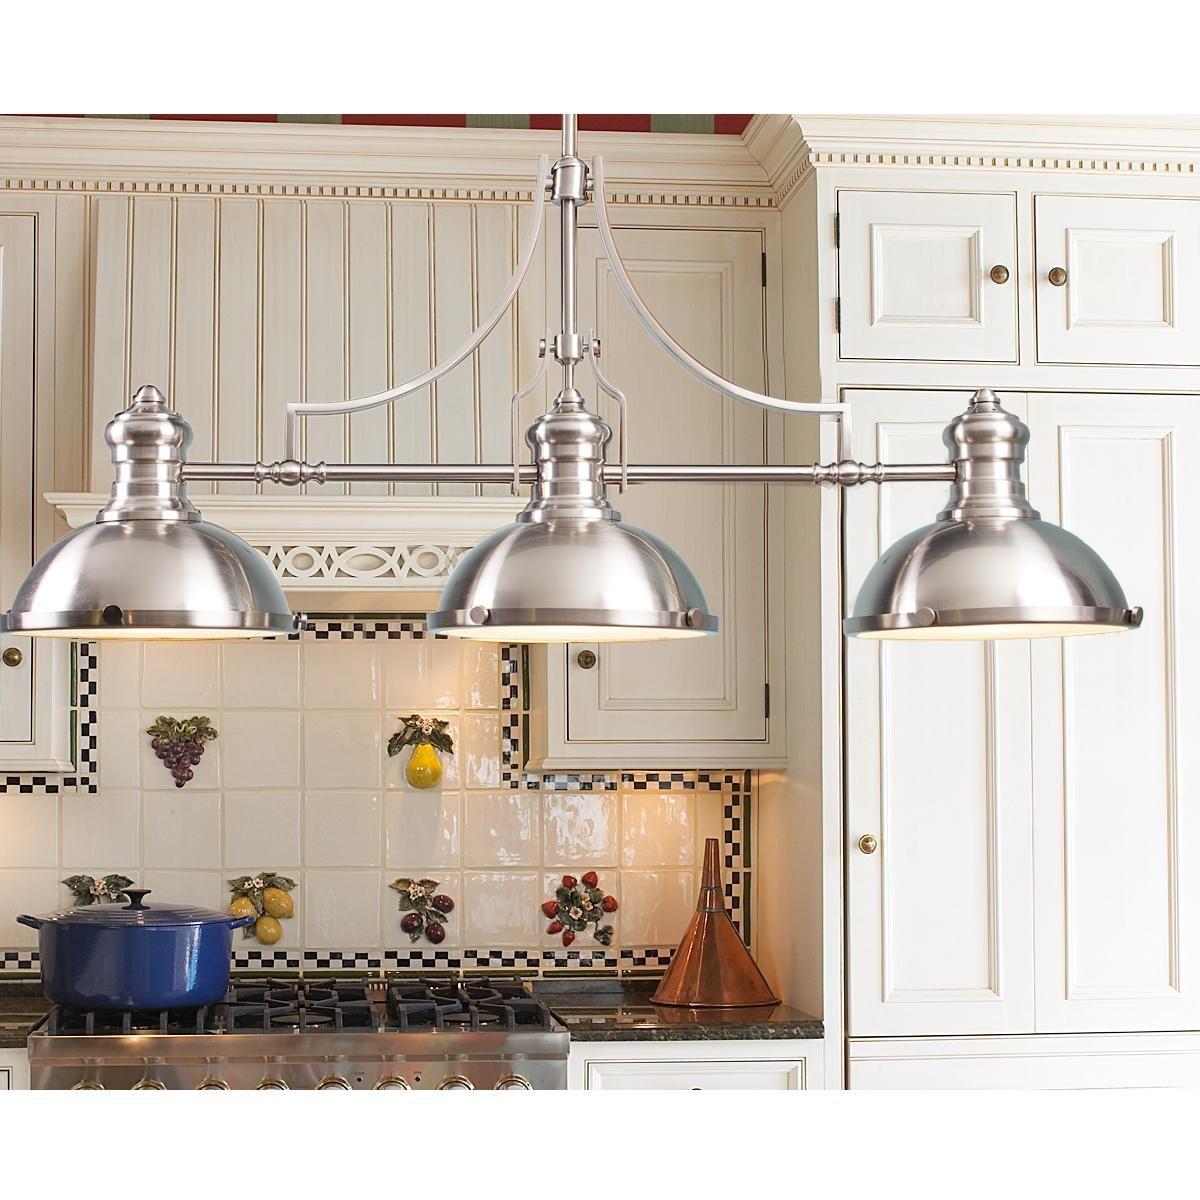 Lighting Over Kitchen Table Best Dining Ideas On Light: Craftsman Period Island Chandelier - 3 Light